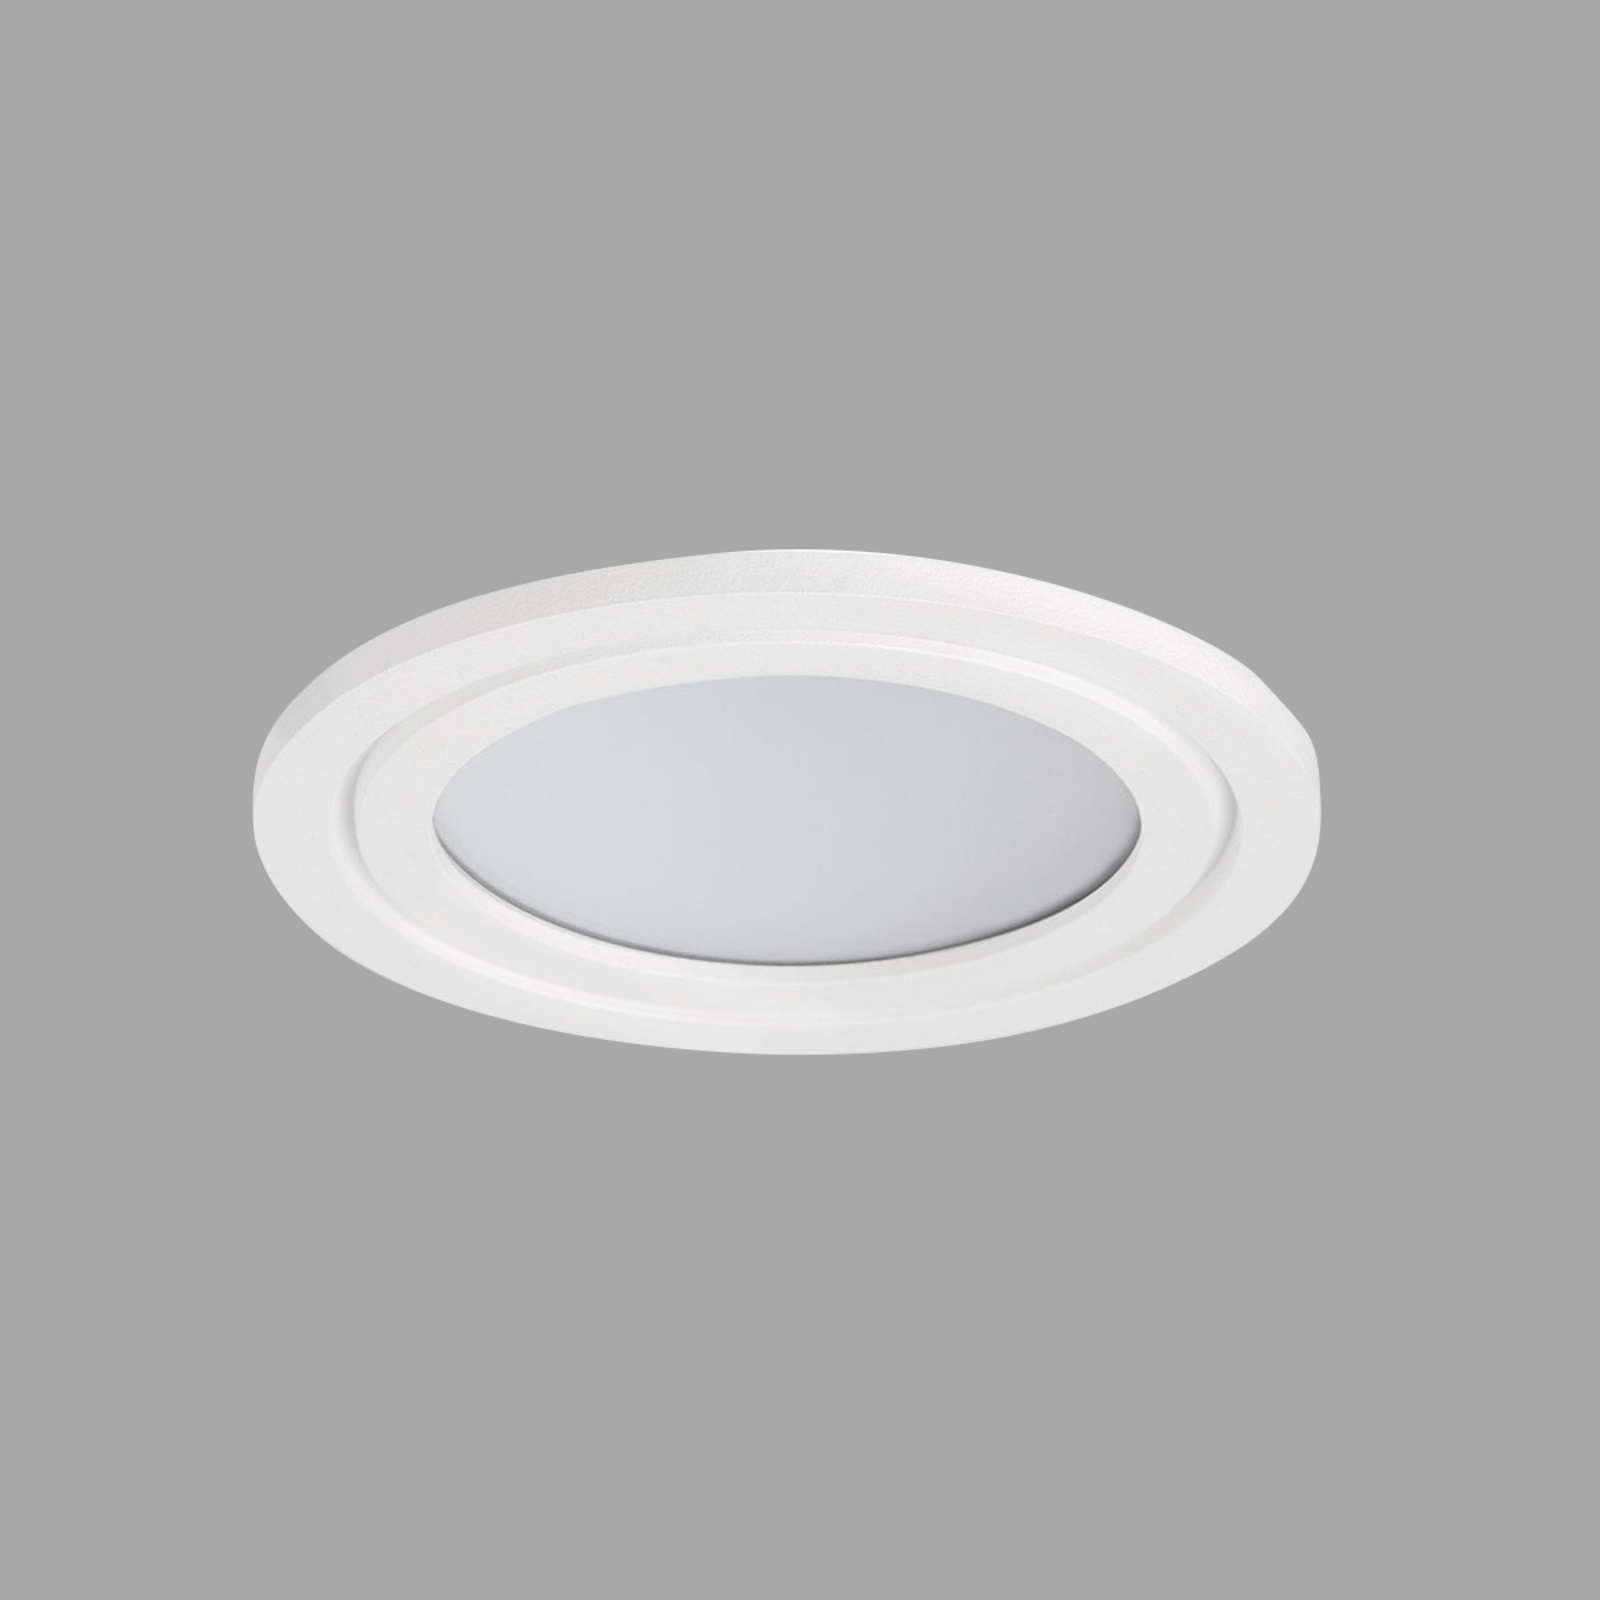 Prettus XS PRO LED-Einbauspot m. Abdeckung, 4.000K